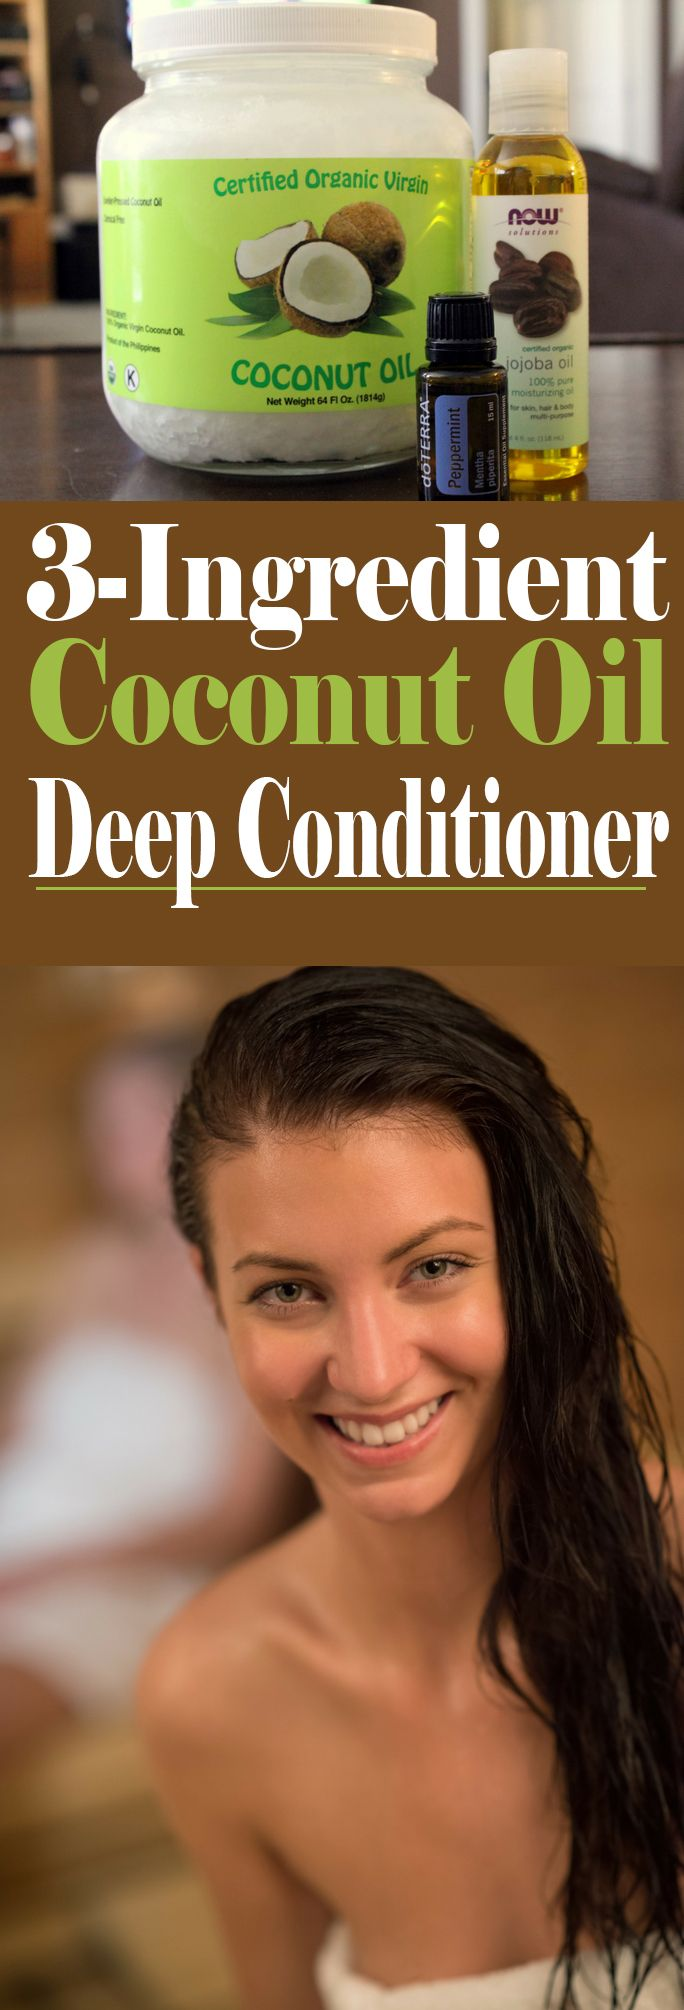 DIY Coconut Oil Deep Conditioner | homemadeforelle.com